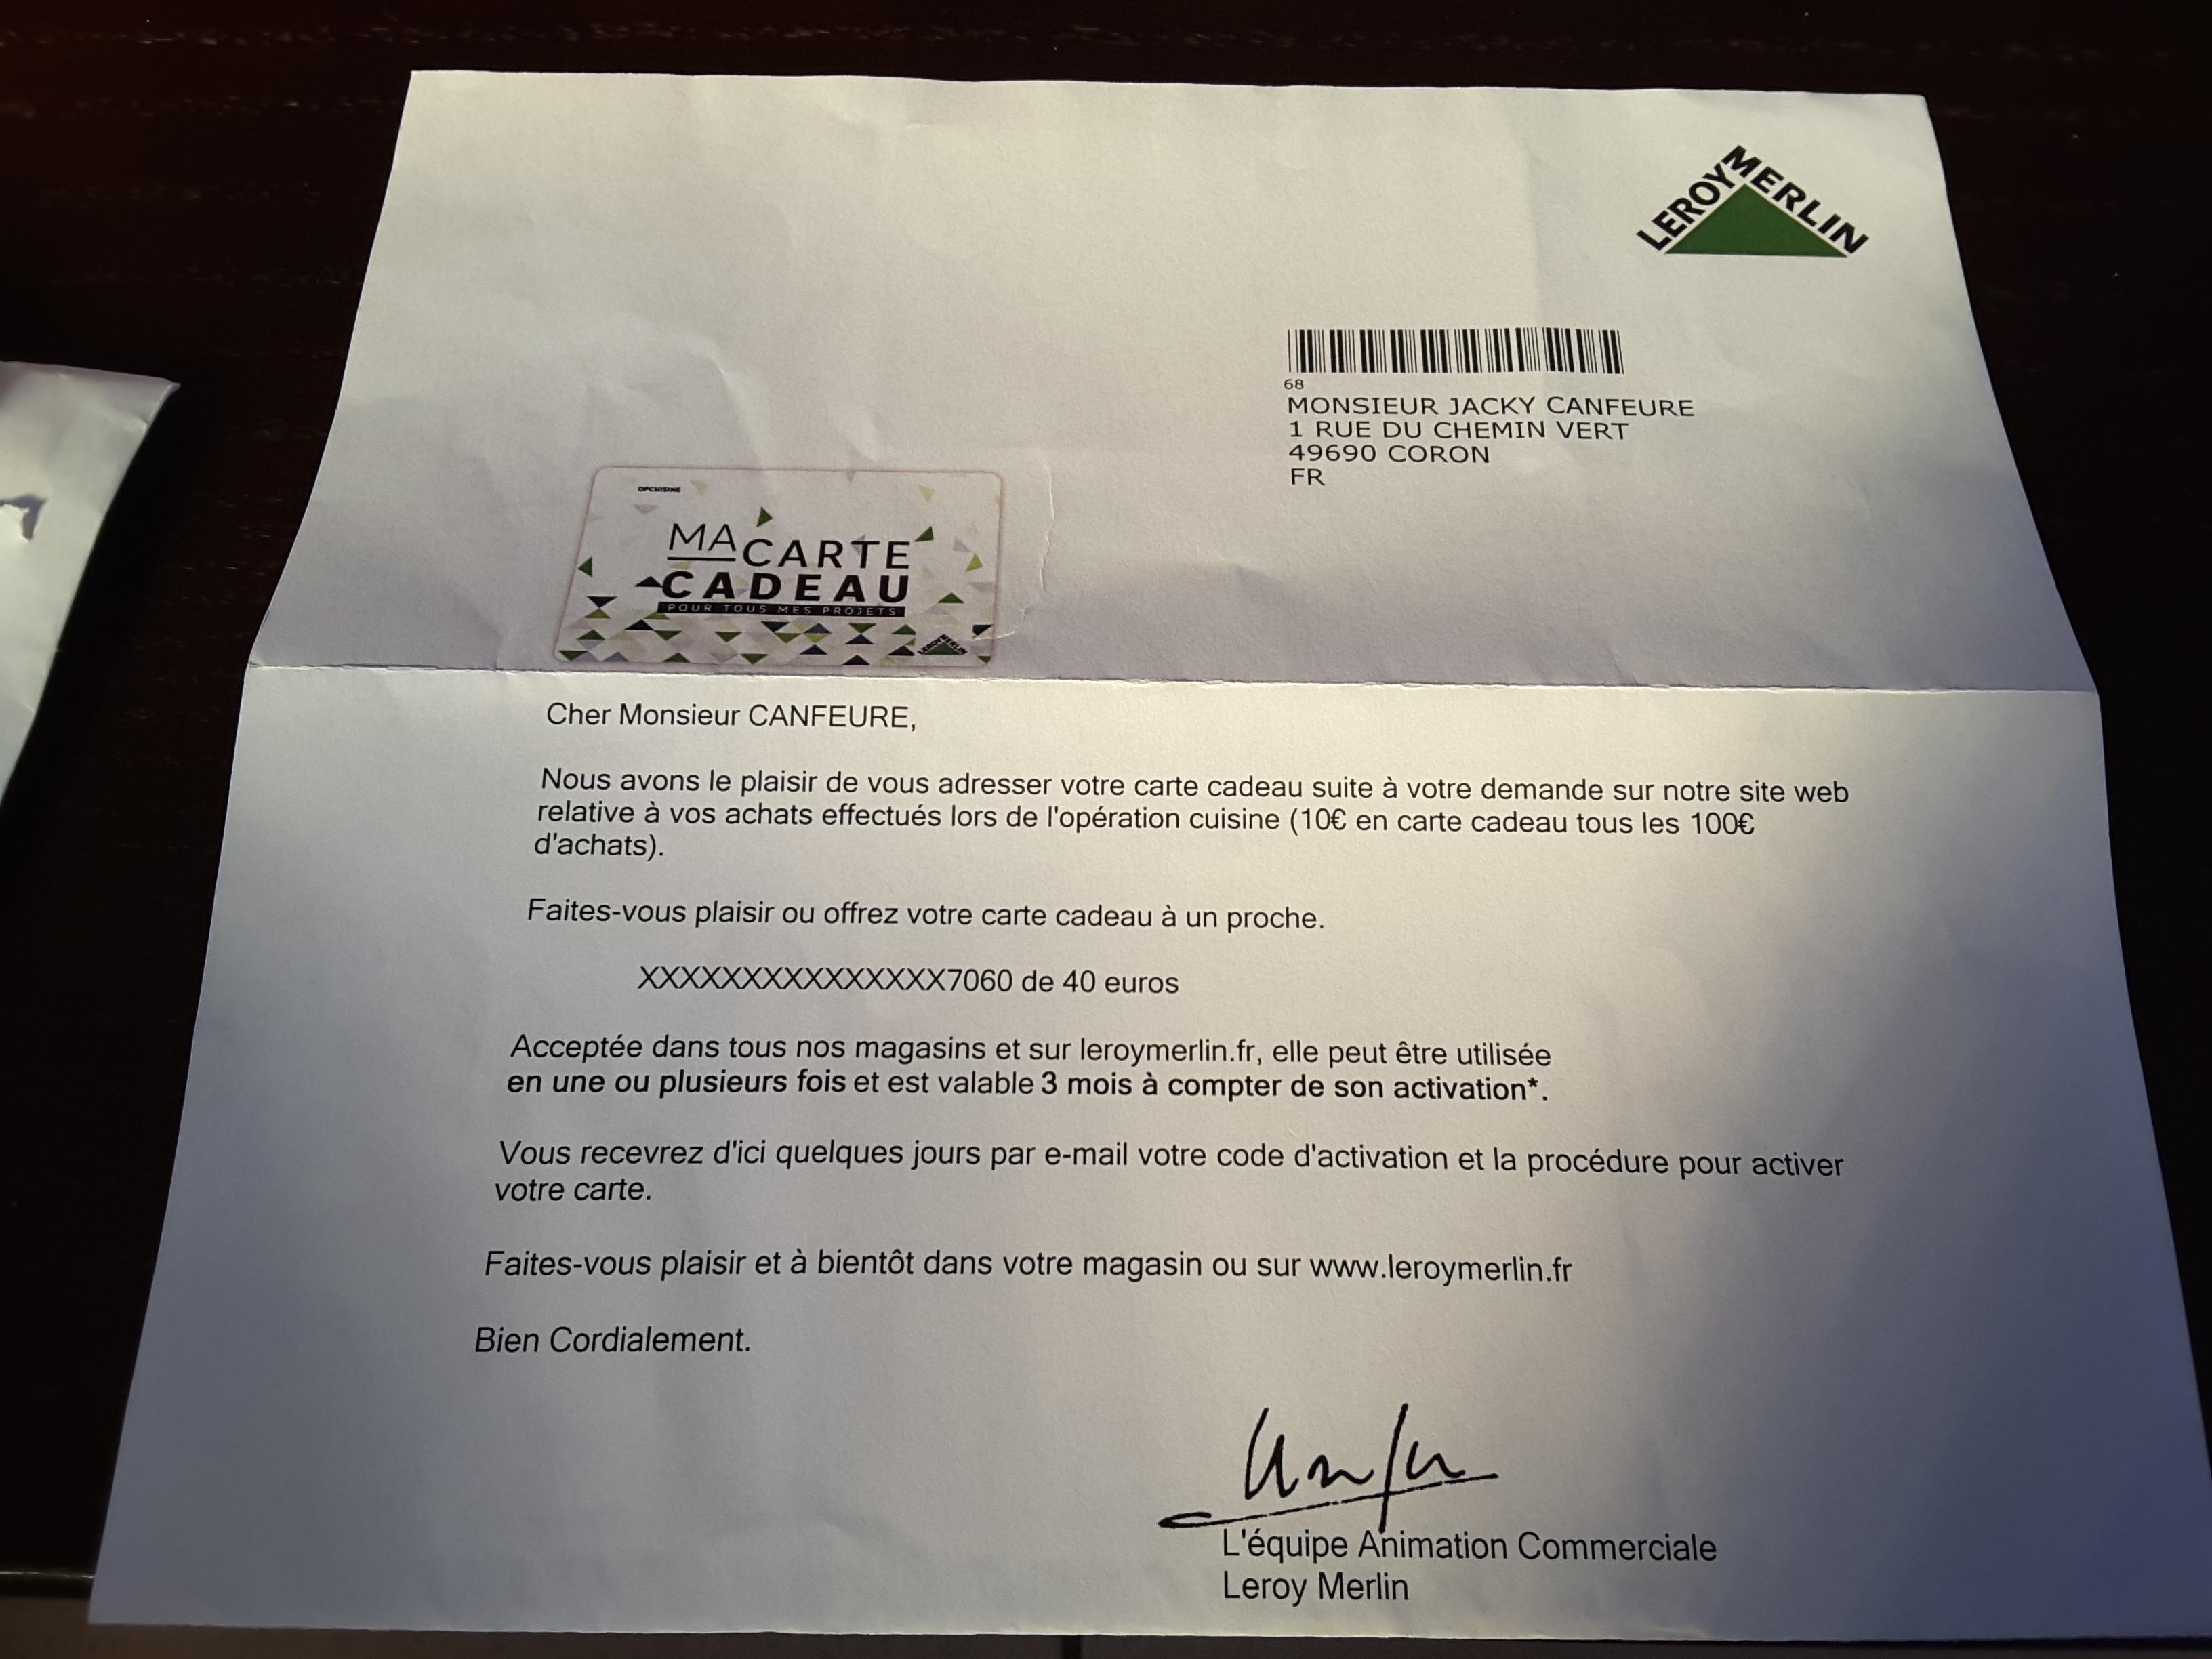 activation carte cadeau leroy merlin Code activation carte cadeau non reçu   Communauté Leroy Merlin